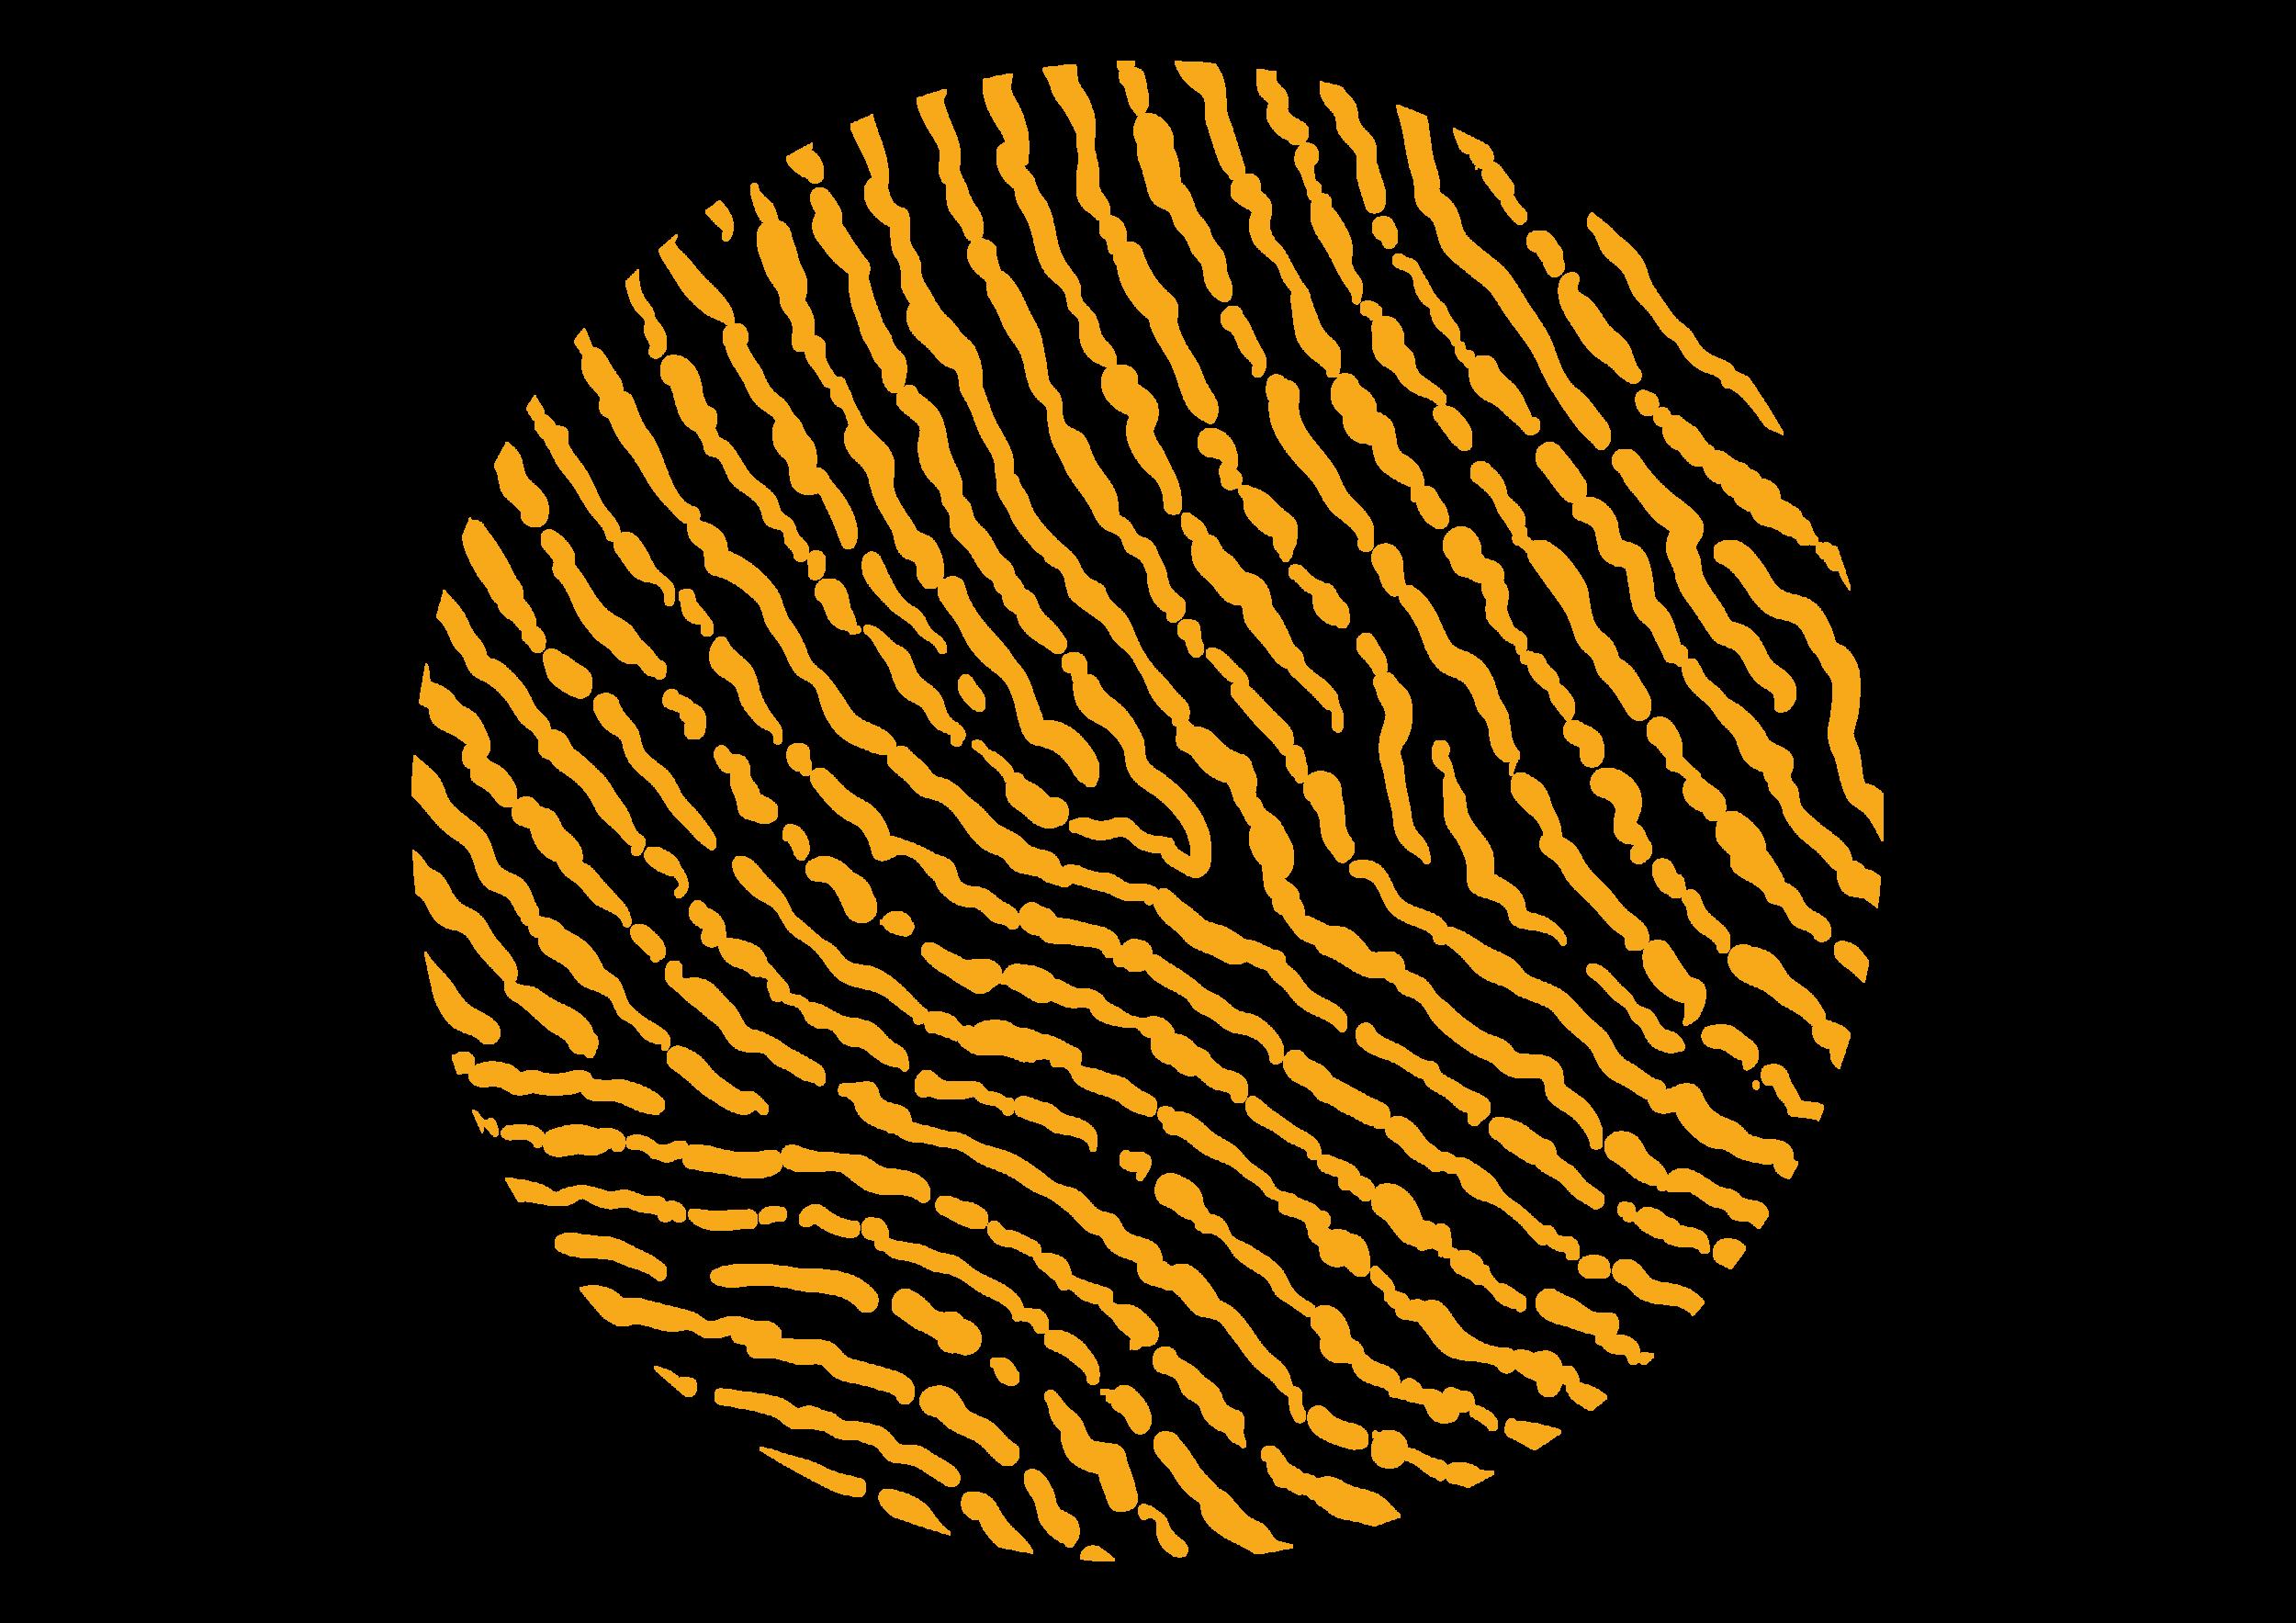 Fingerprint_5.png